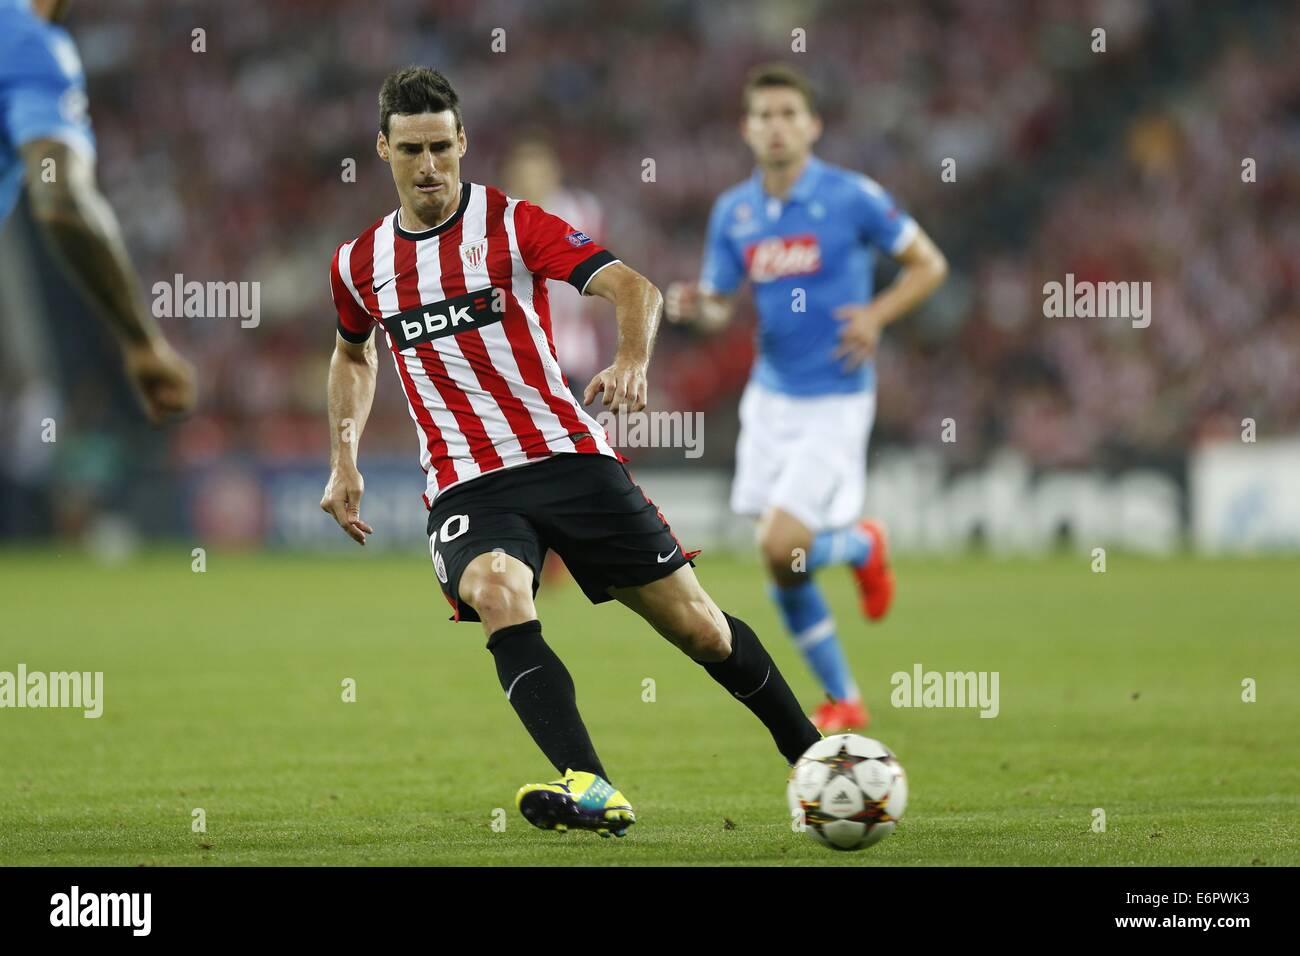 Bilbao Spain 27th Aug 2014 Aritz Aduriz Bilbao Football